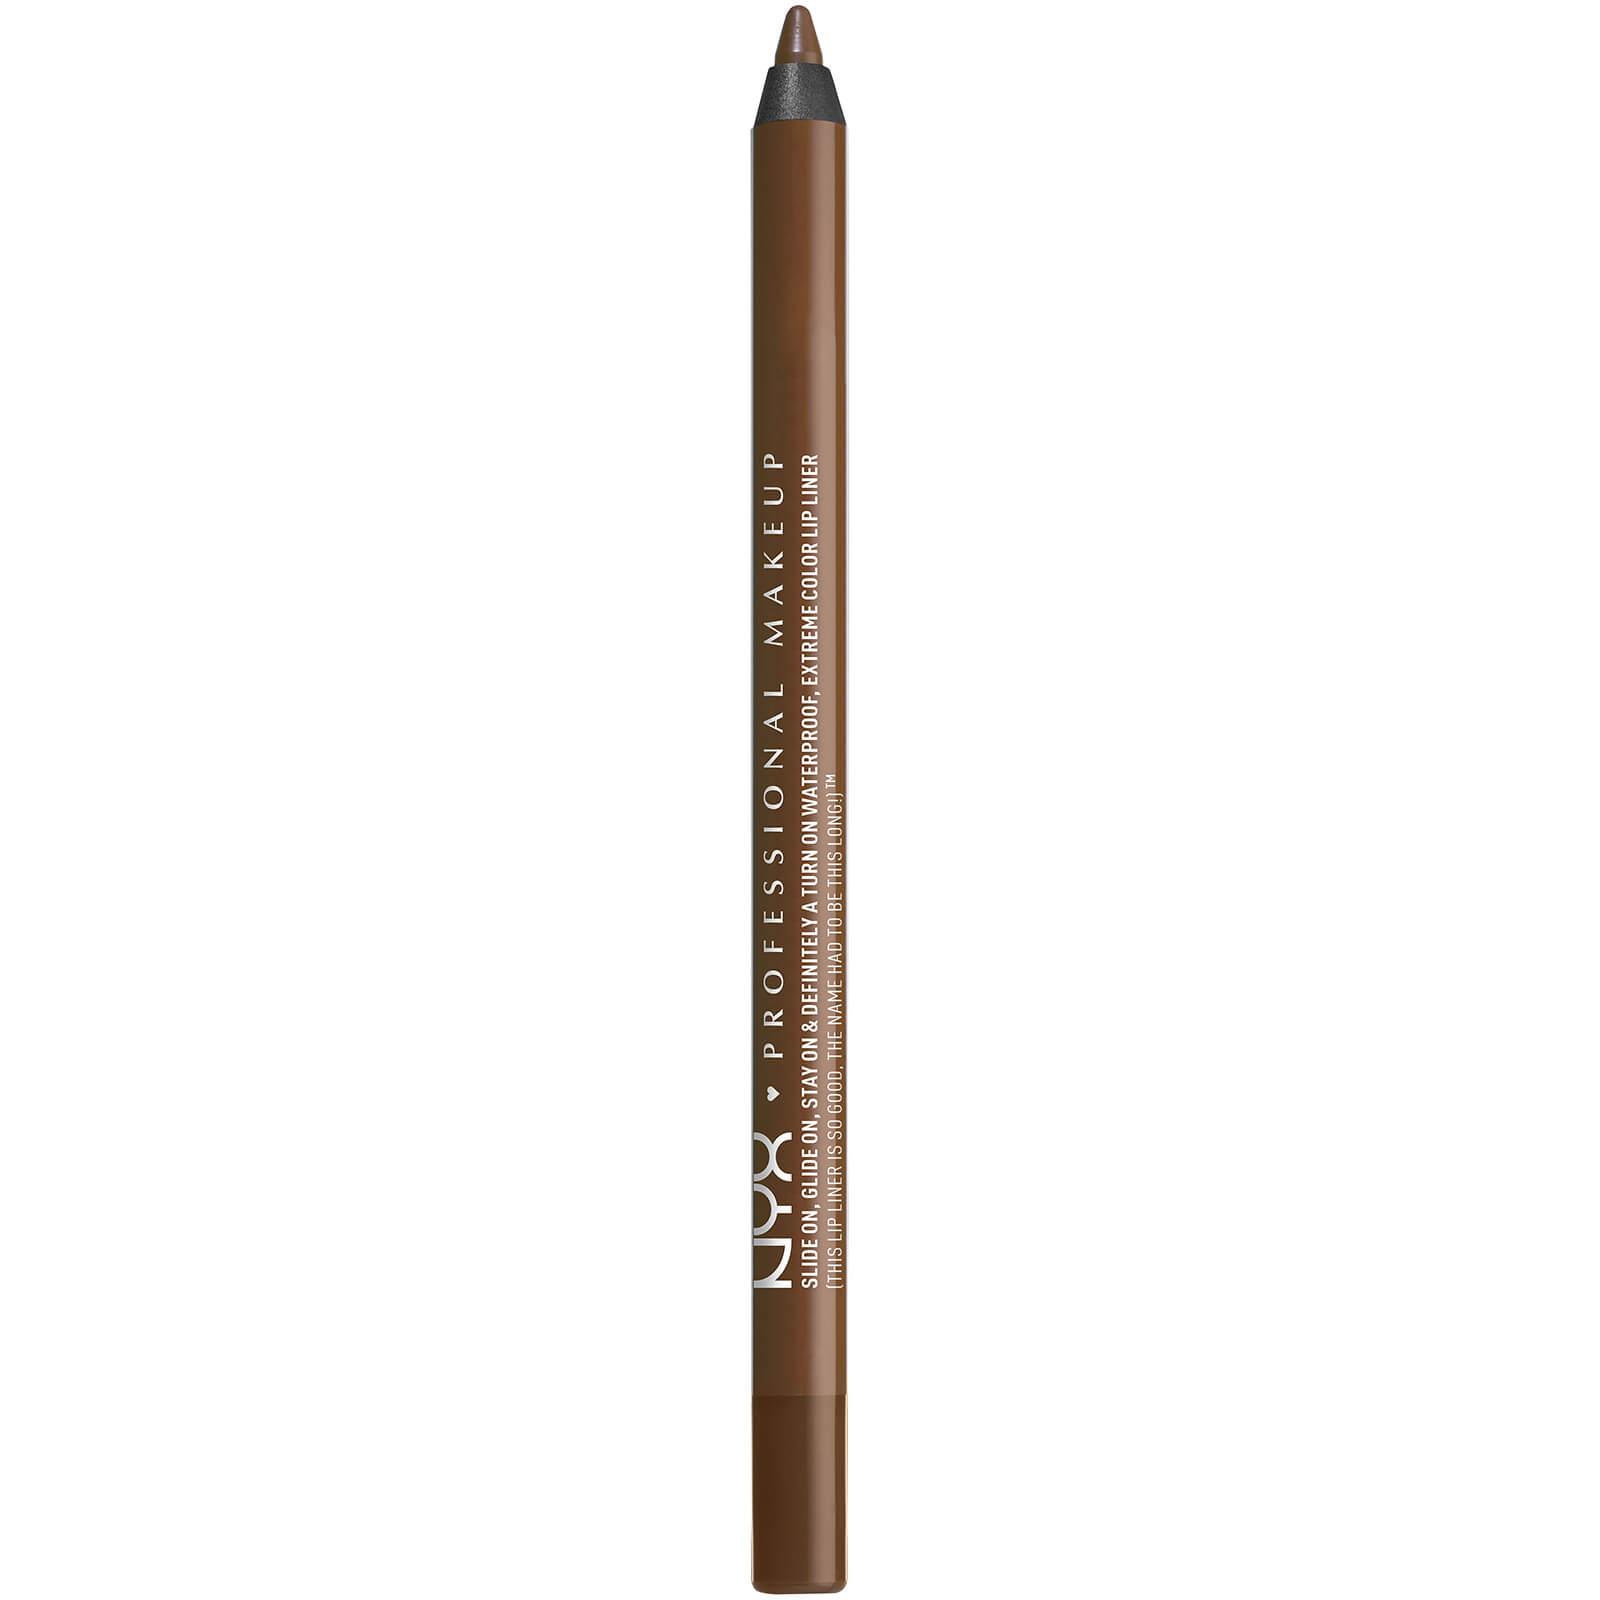 NYX Professional Makeup Slide On Lip Pencil (Various Shades) - Urban Café